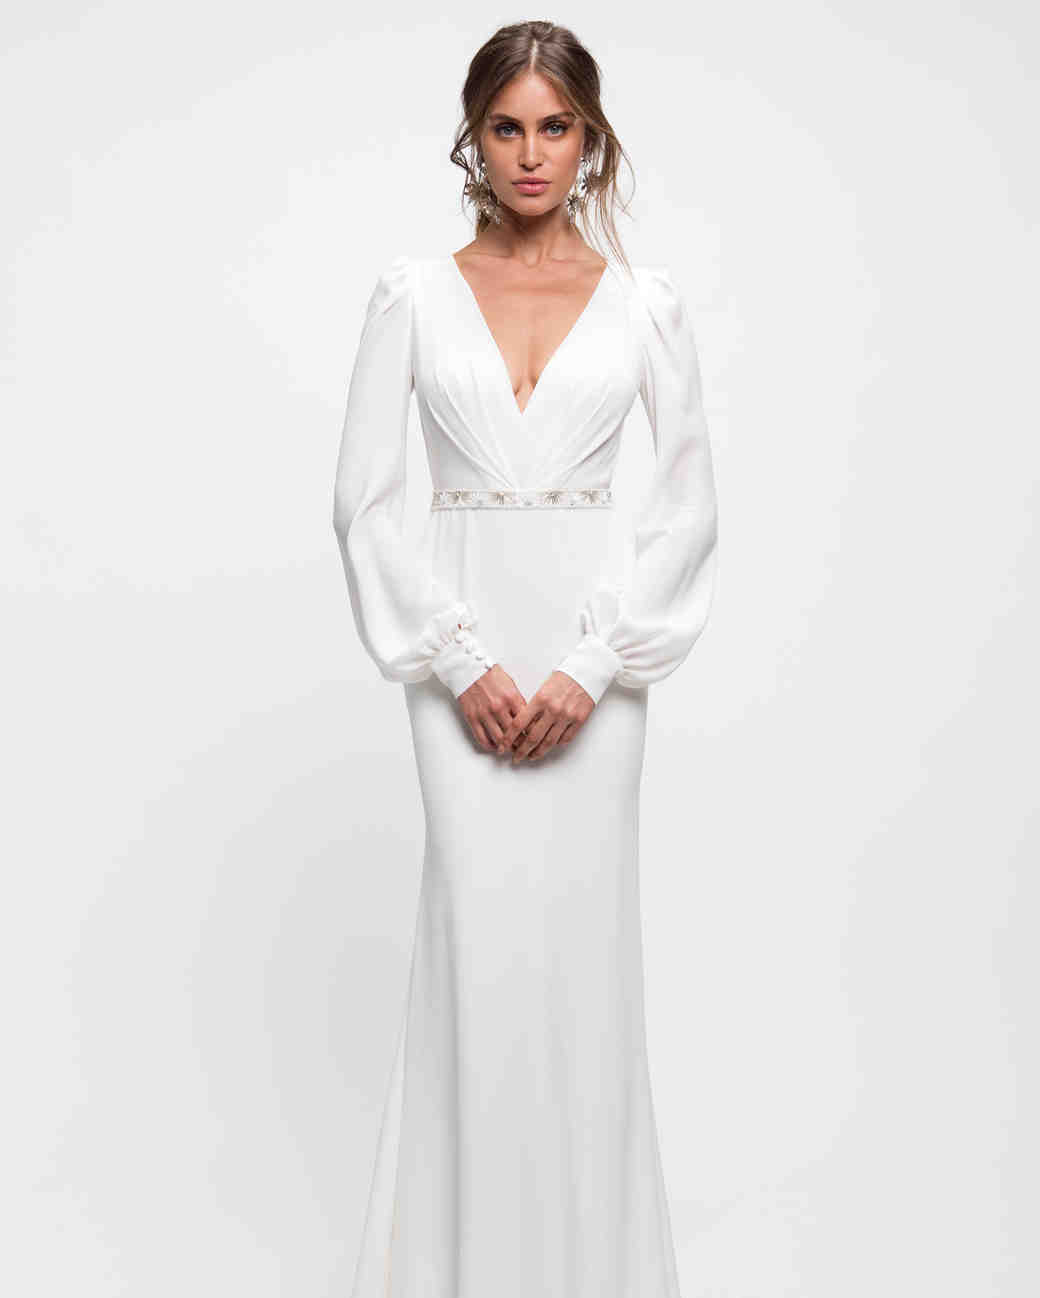 Long-Sleeved Wedding Dresses We Love | Martha Stewart Weddings